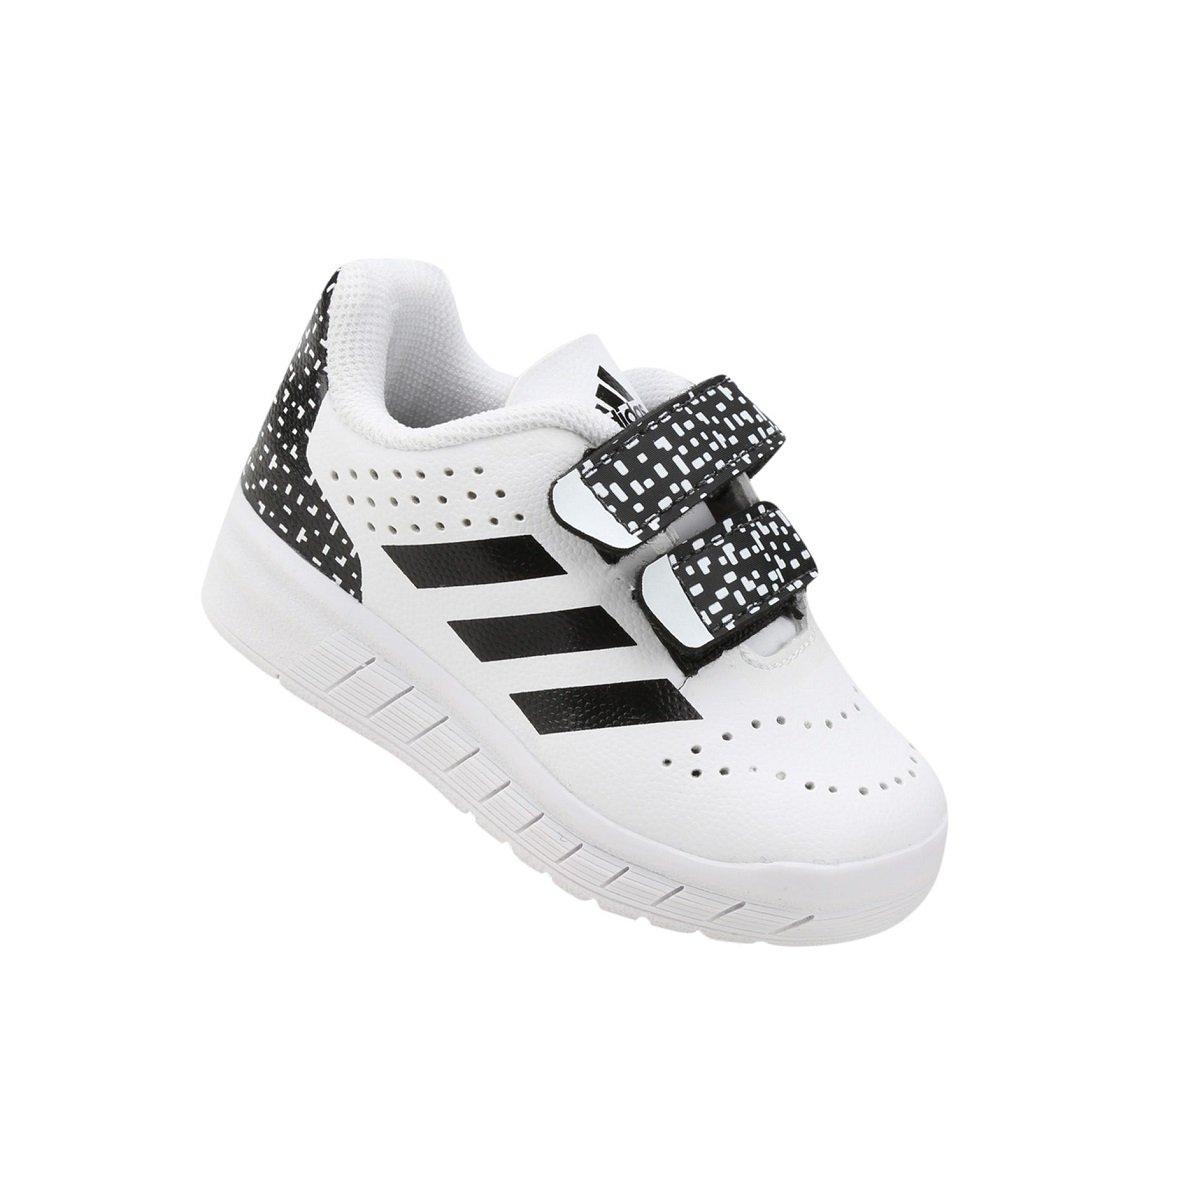 558405b64 Amplie a imagem. Tênis Infantil Adidas Quicksport CF 1  Tênis Infantil  Adidas Quicksport CF 1 2  Tênis ...